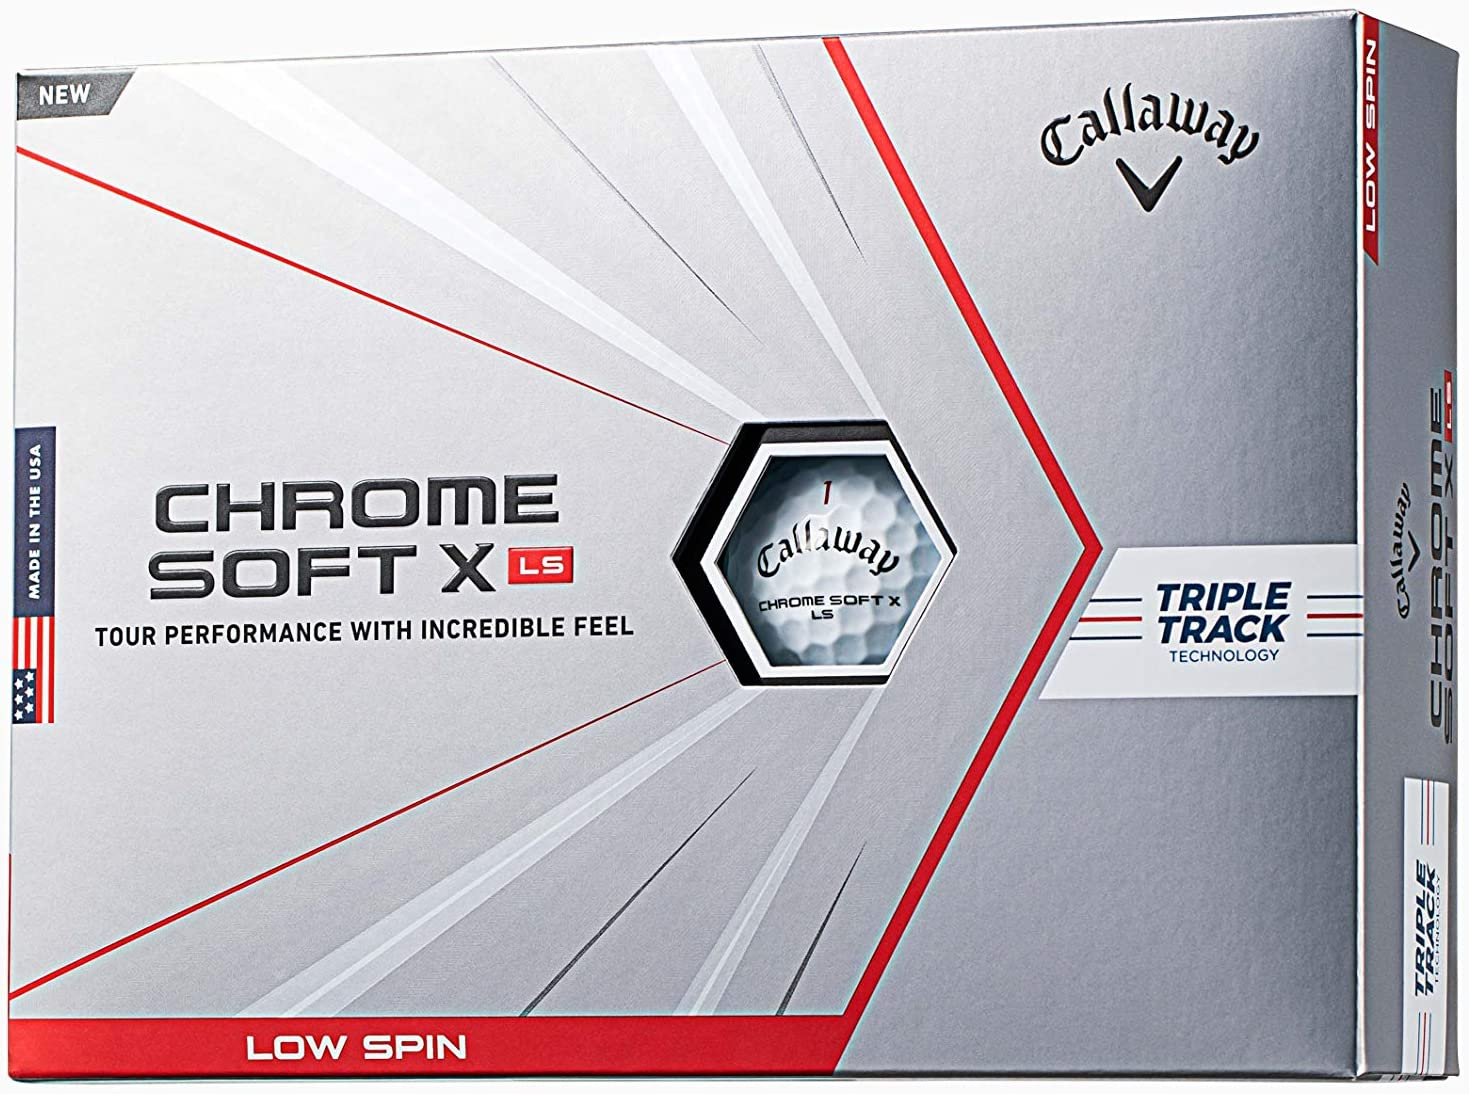 CHROME SOFT X LS